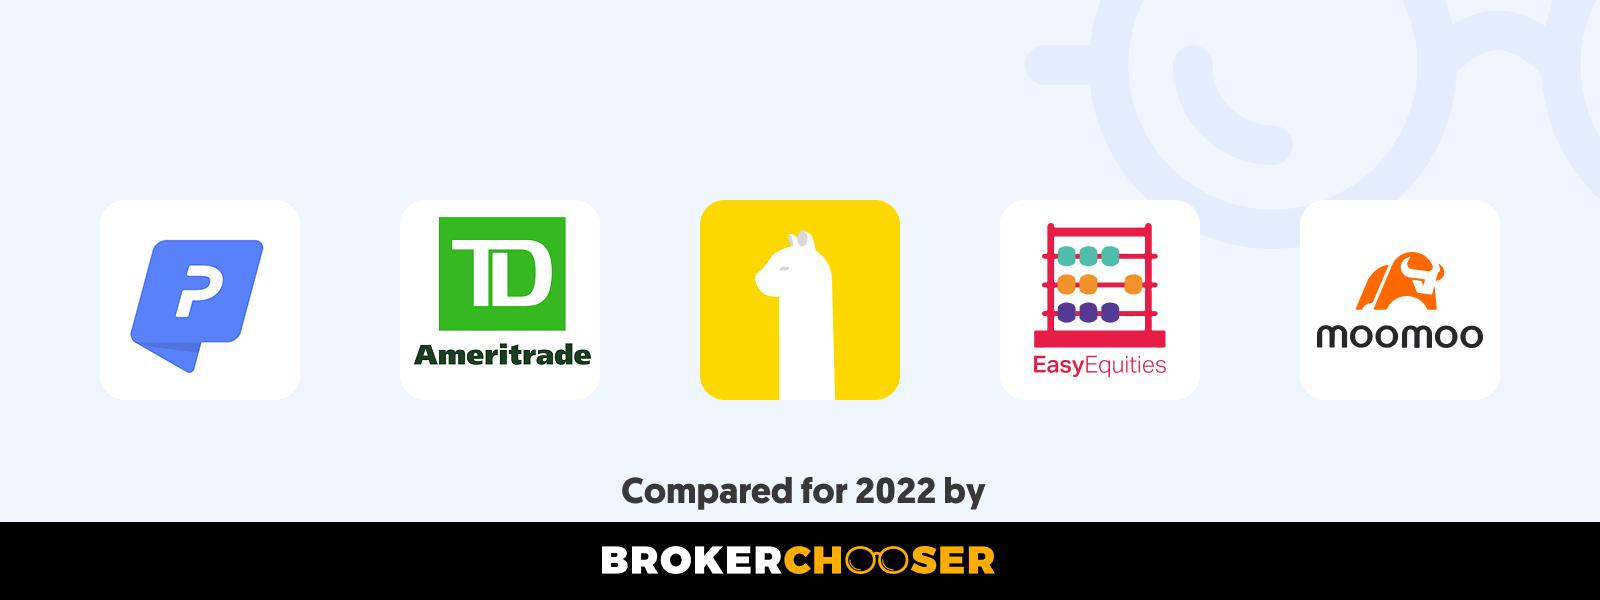 Best brokers for beginners in Singapore in 2021